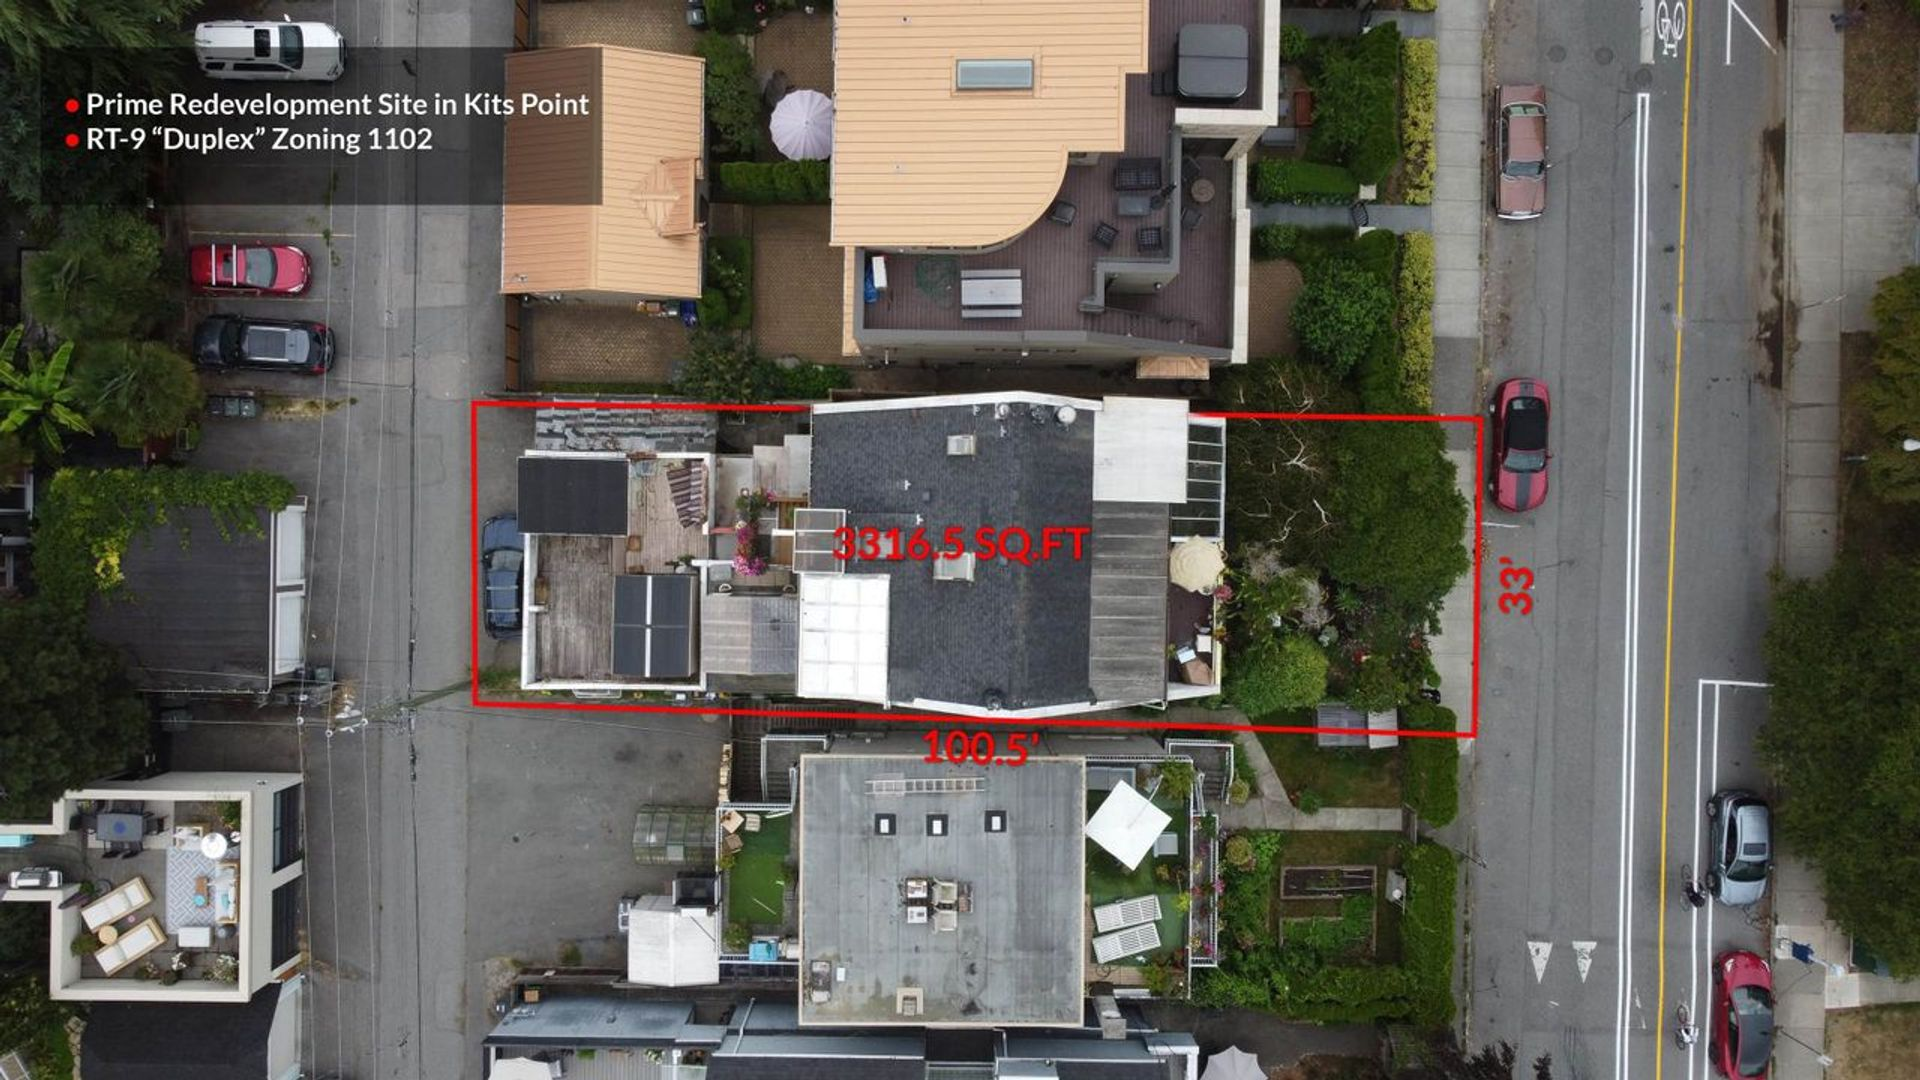 1354-arbutus-street-kitsilano-vancouver-west-02 at 1354 Arbutus Street, Kitsilano, Vancouver West